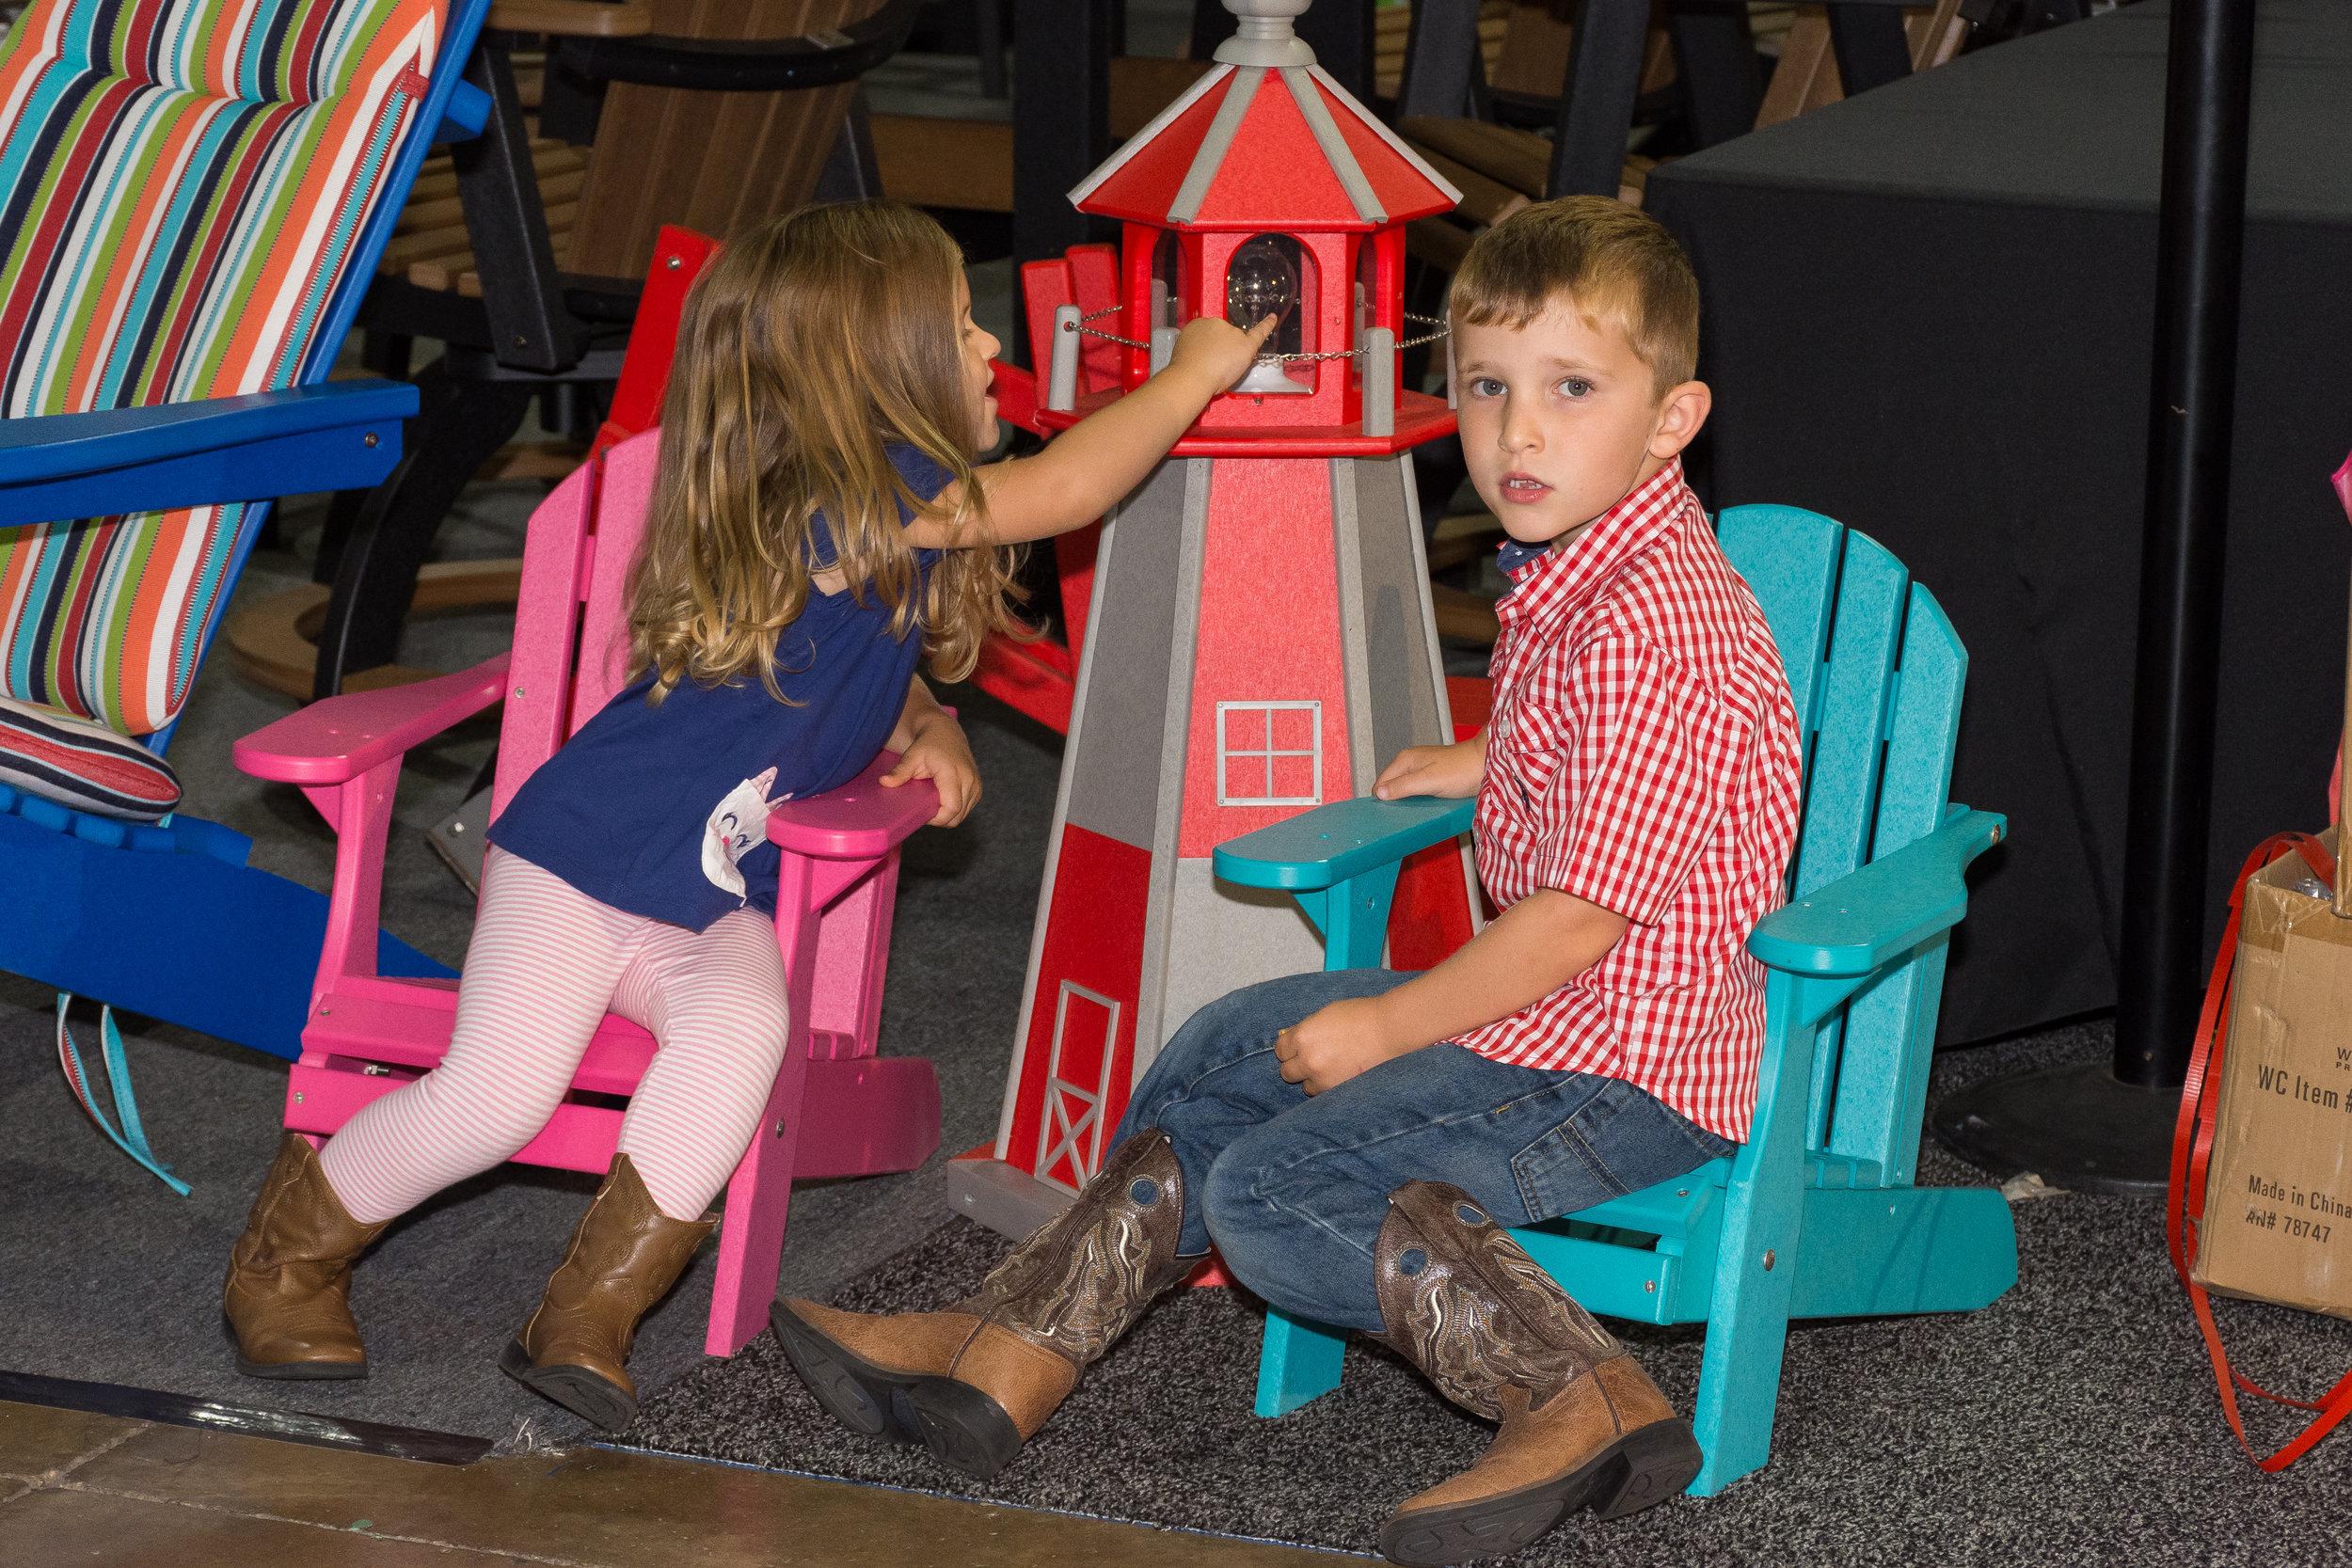 DSC_4758-having fun in kids furniture.JPG